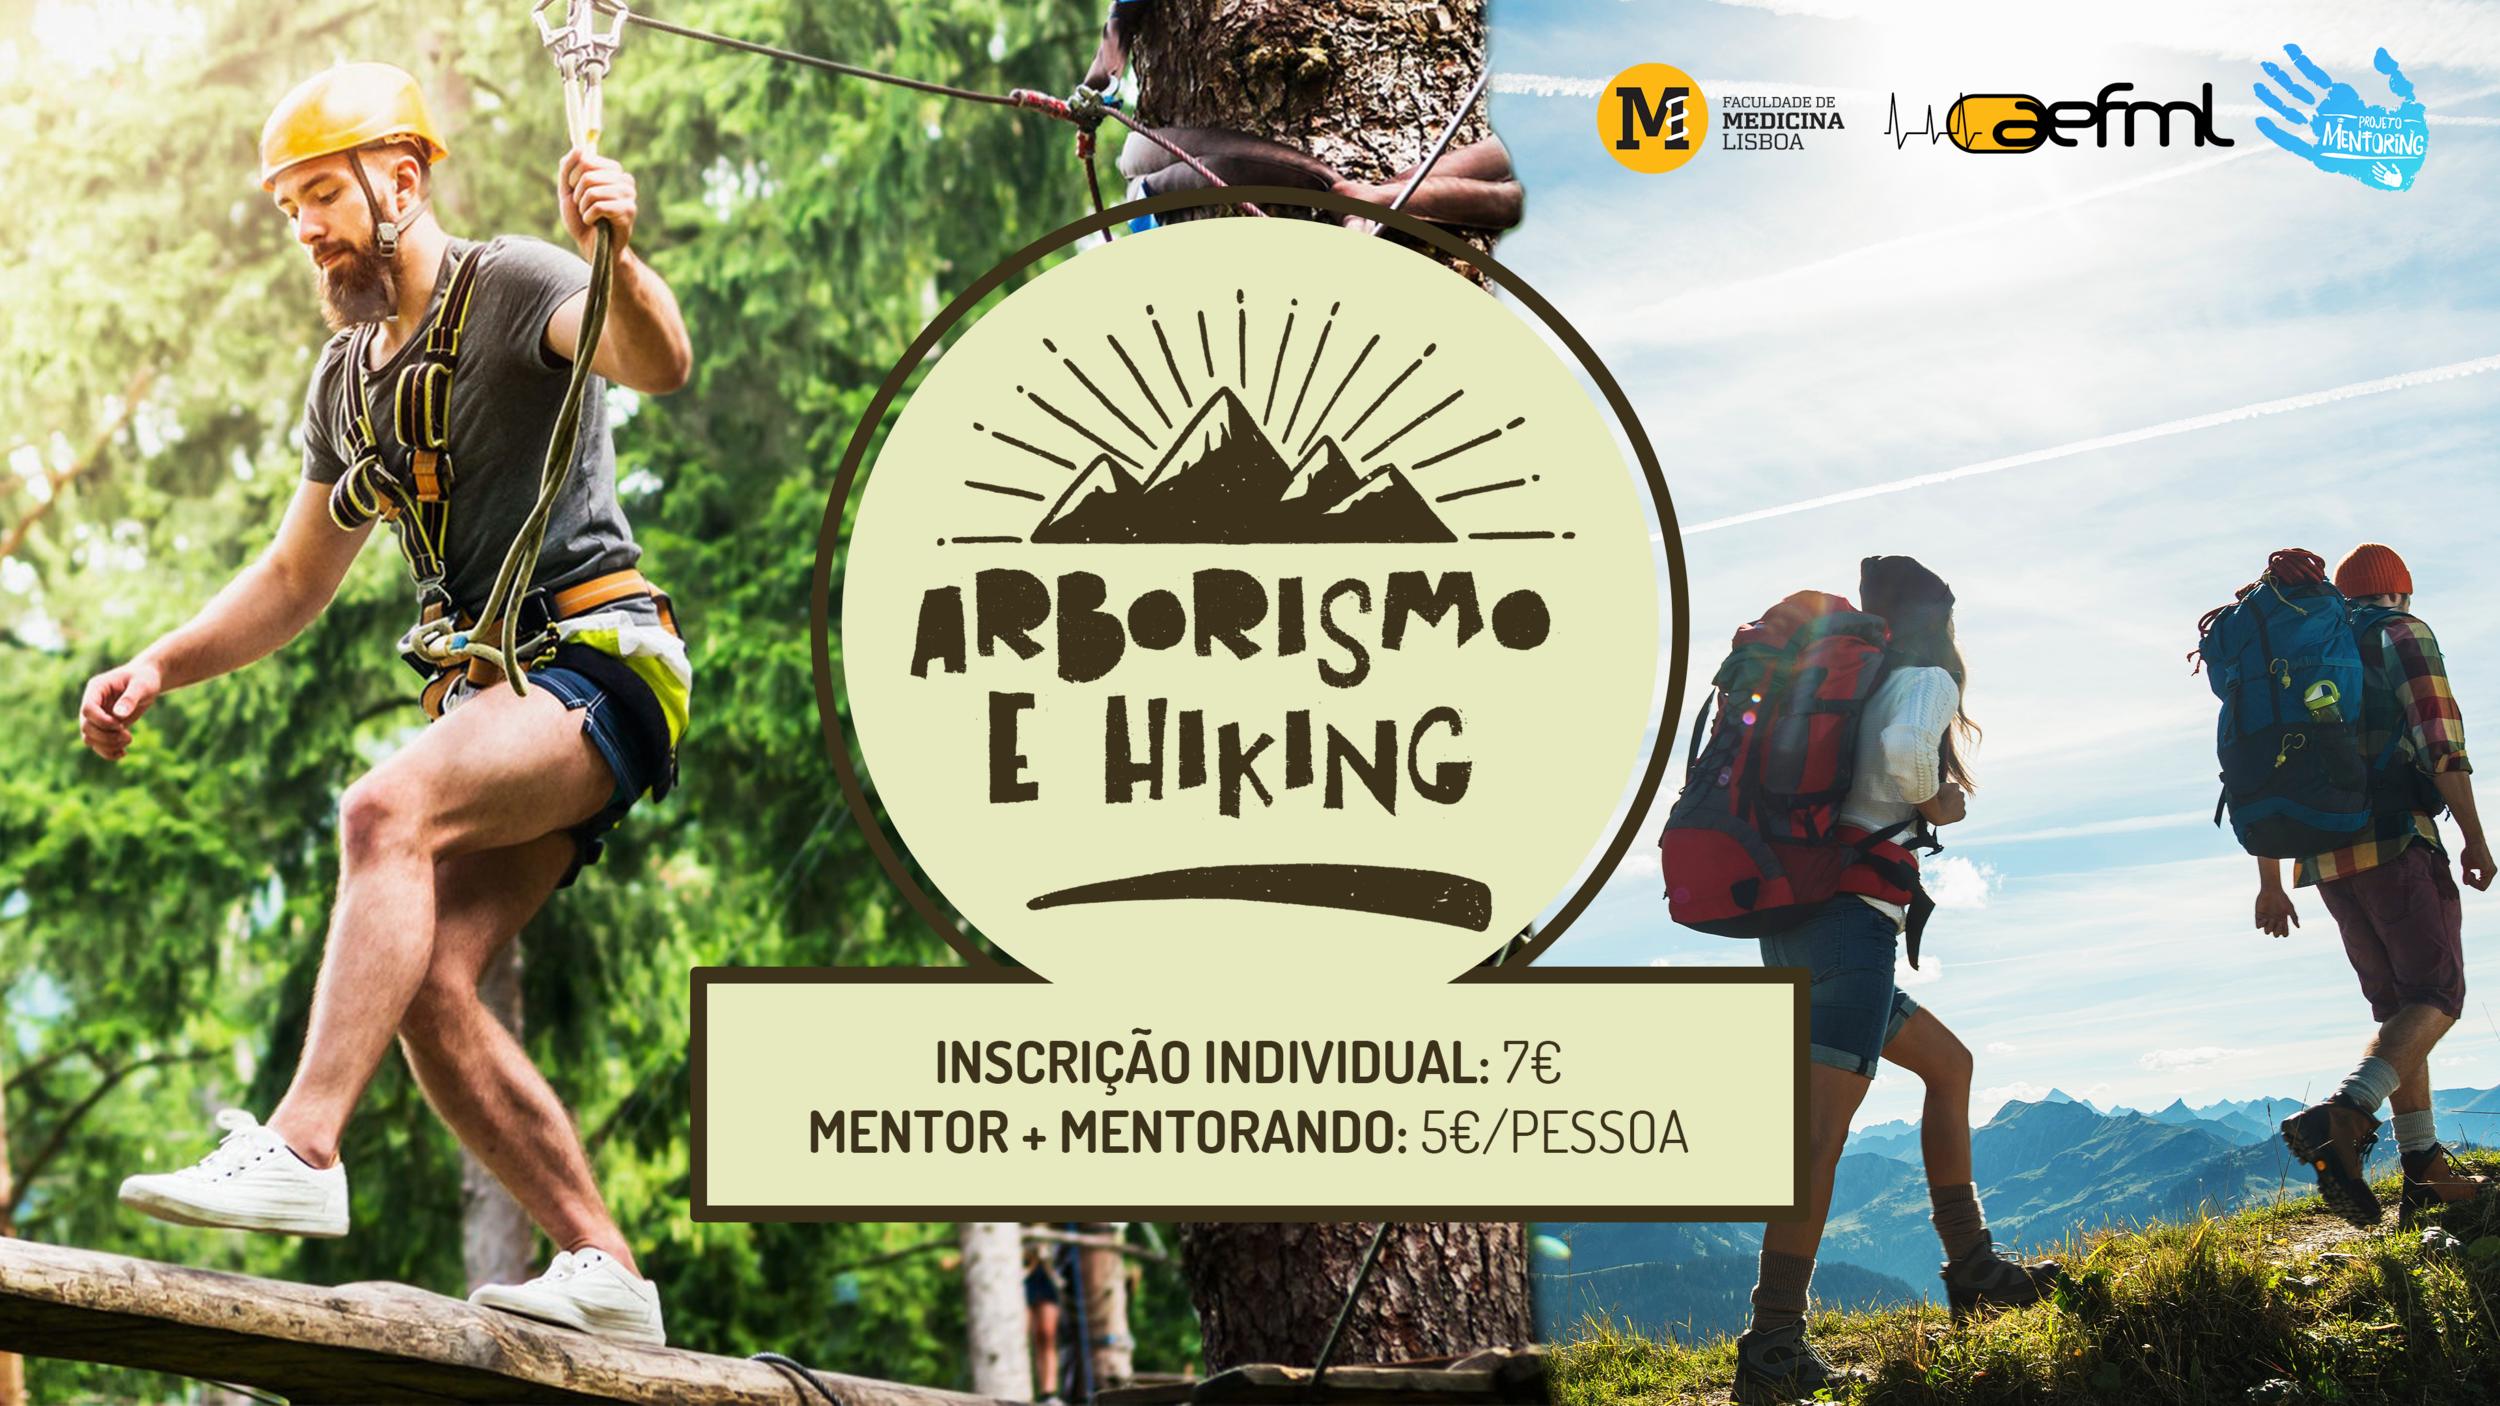 Arborismo e Hiking - 2.png